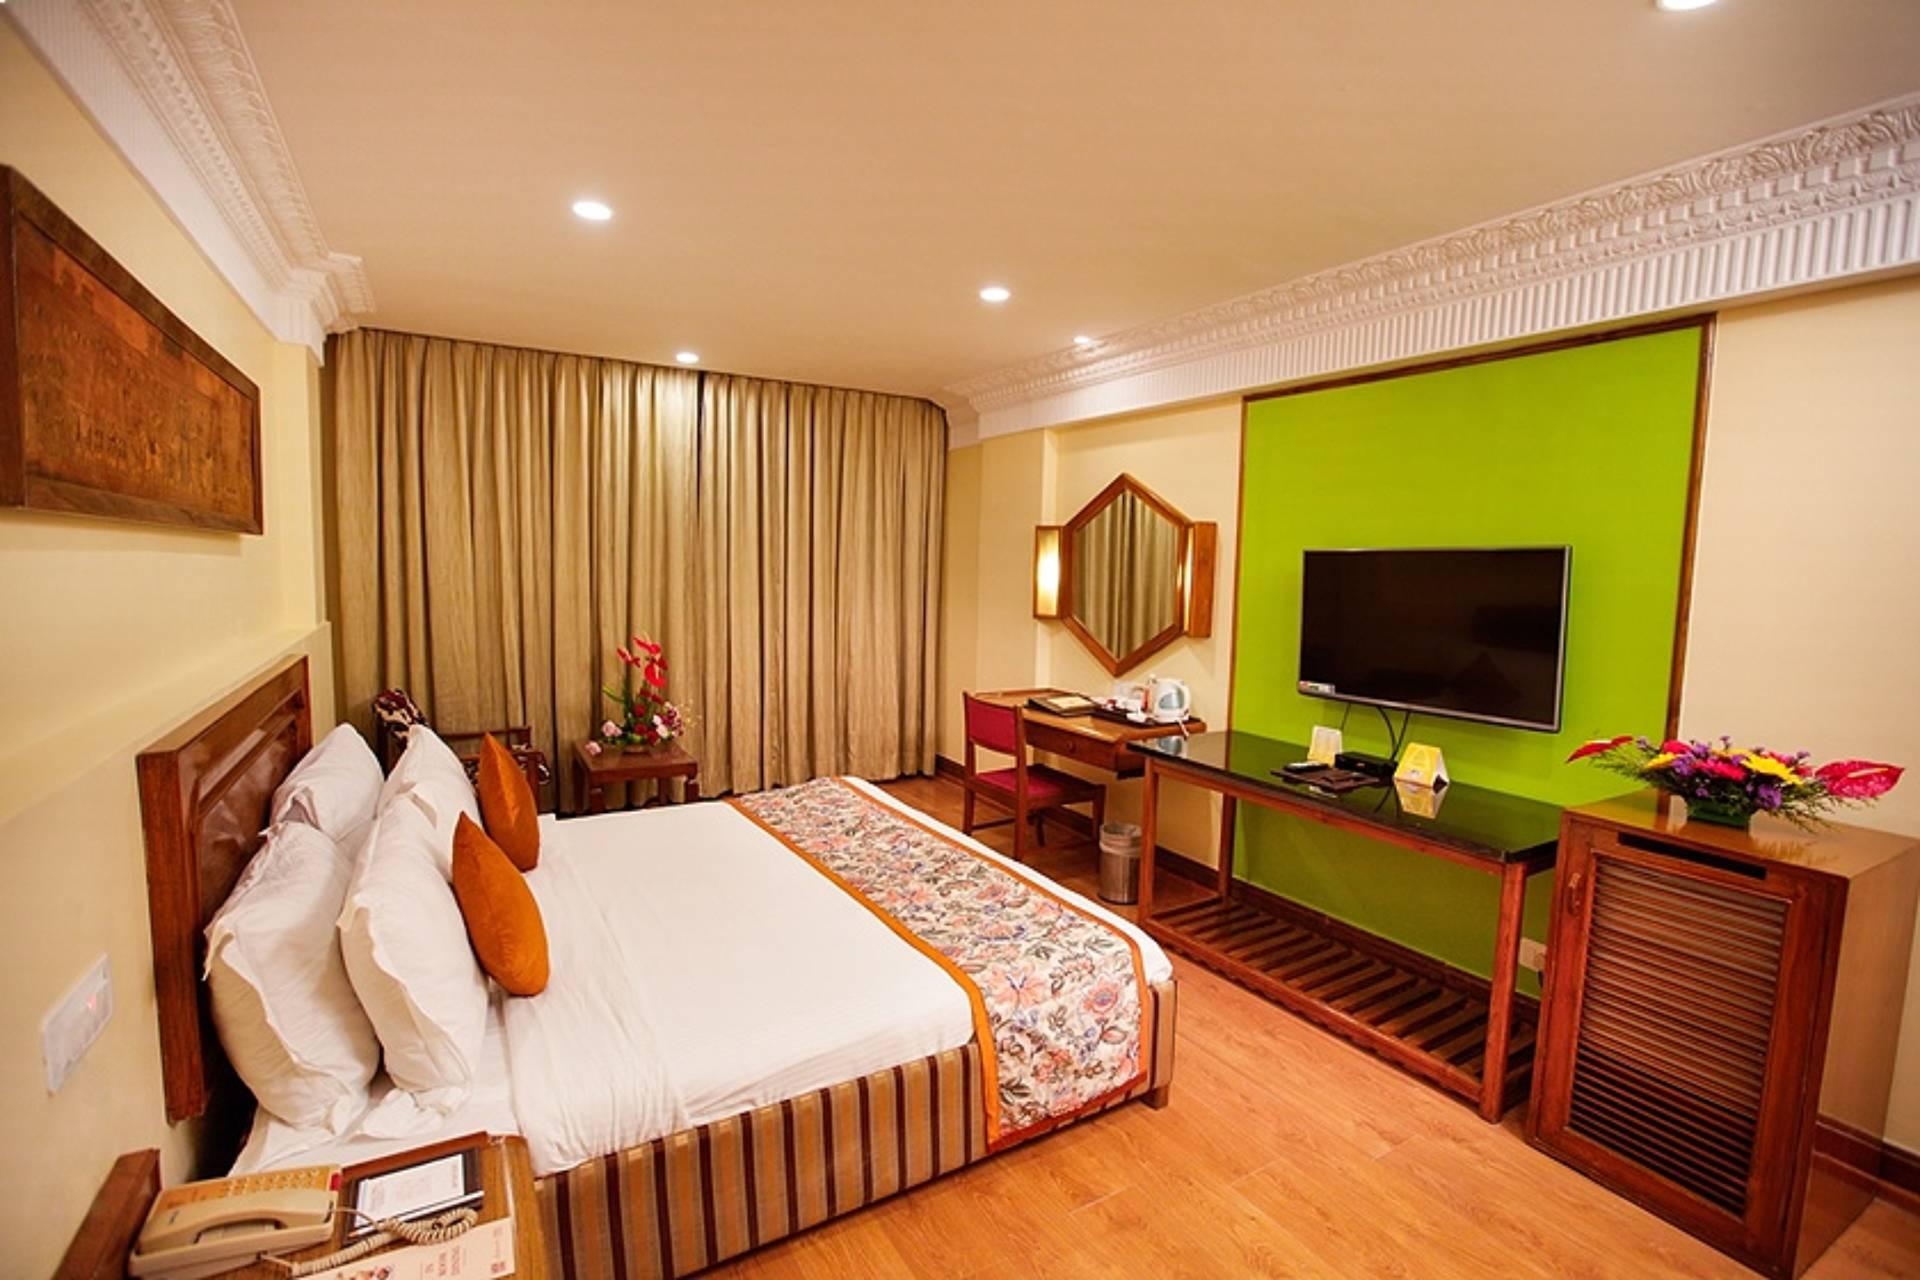 chennai executive room ambassador pallava tv 2 - The Ambassador | Heritage Hotels in Mumbai, Aurangabad, Chennai - Our Rooms